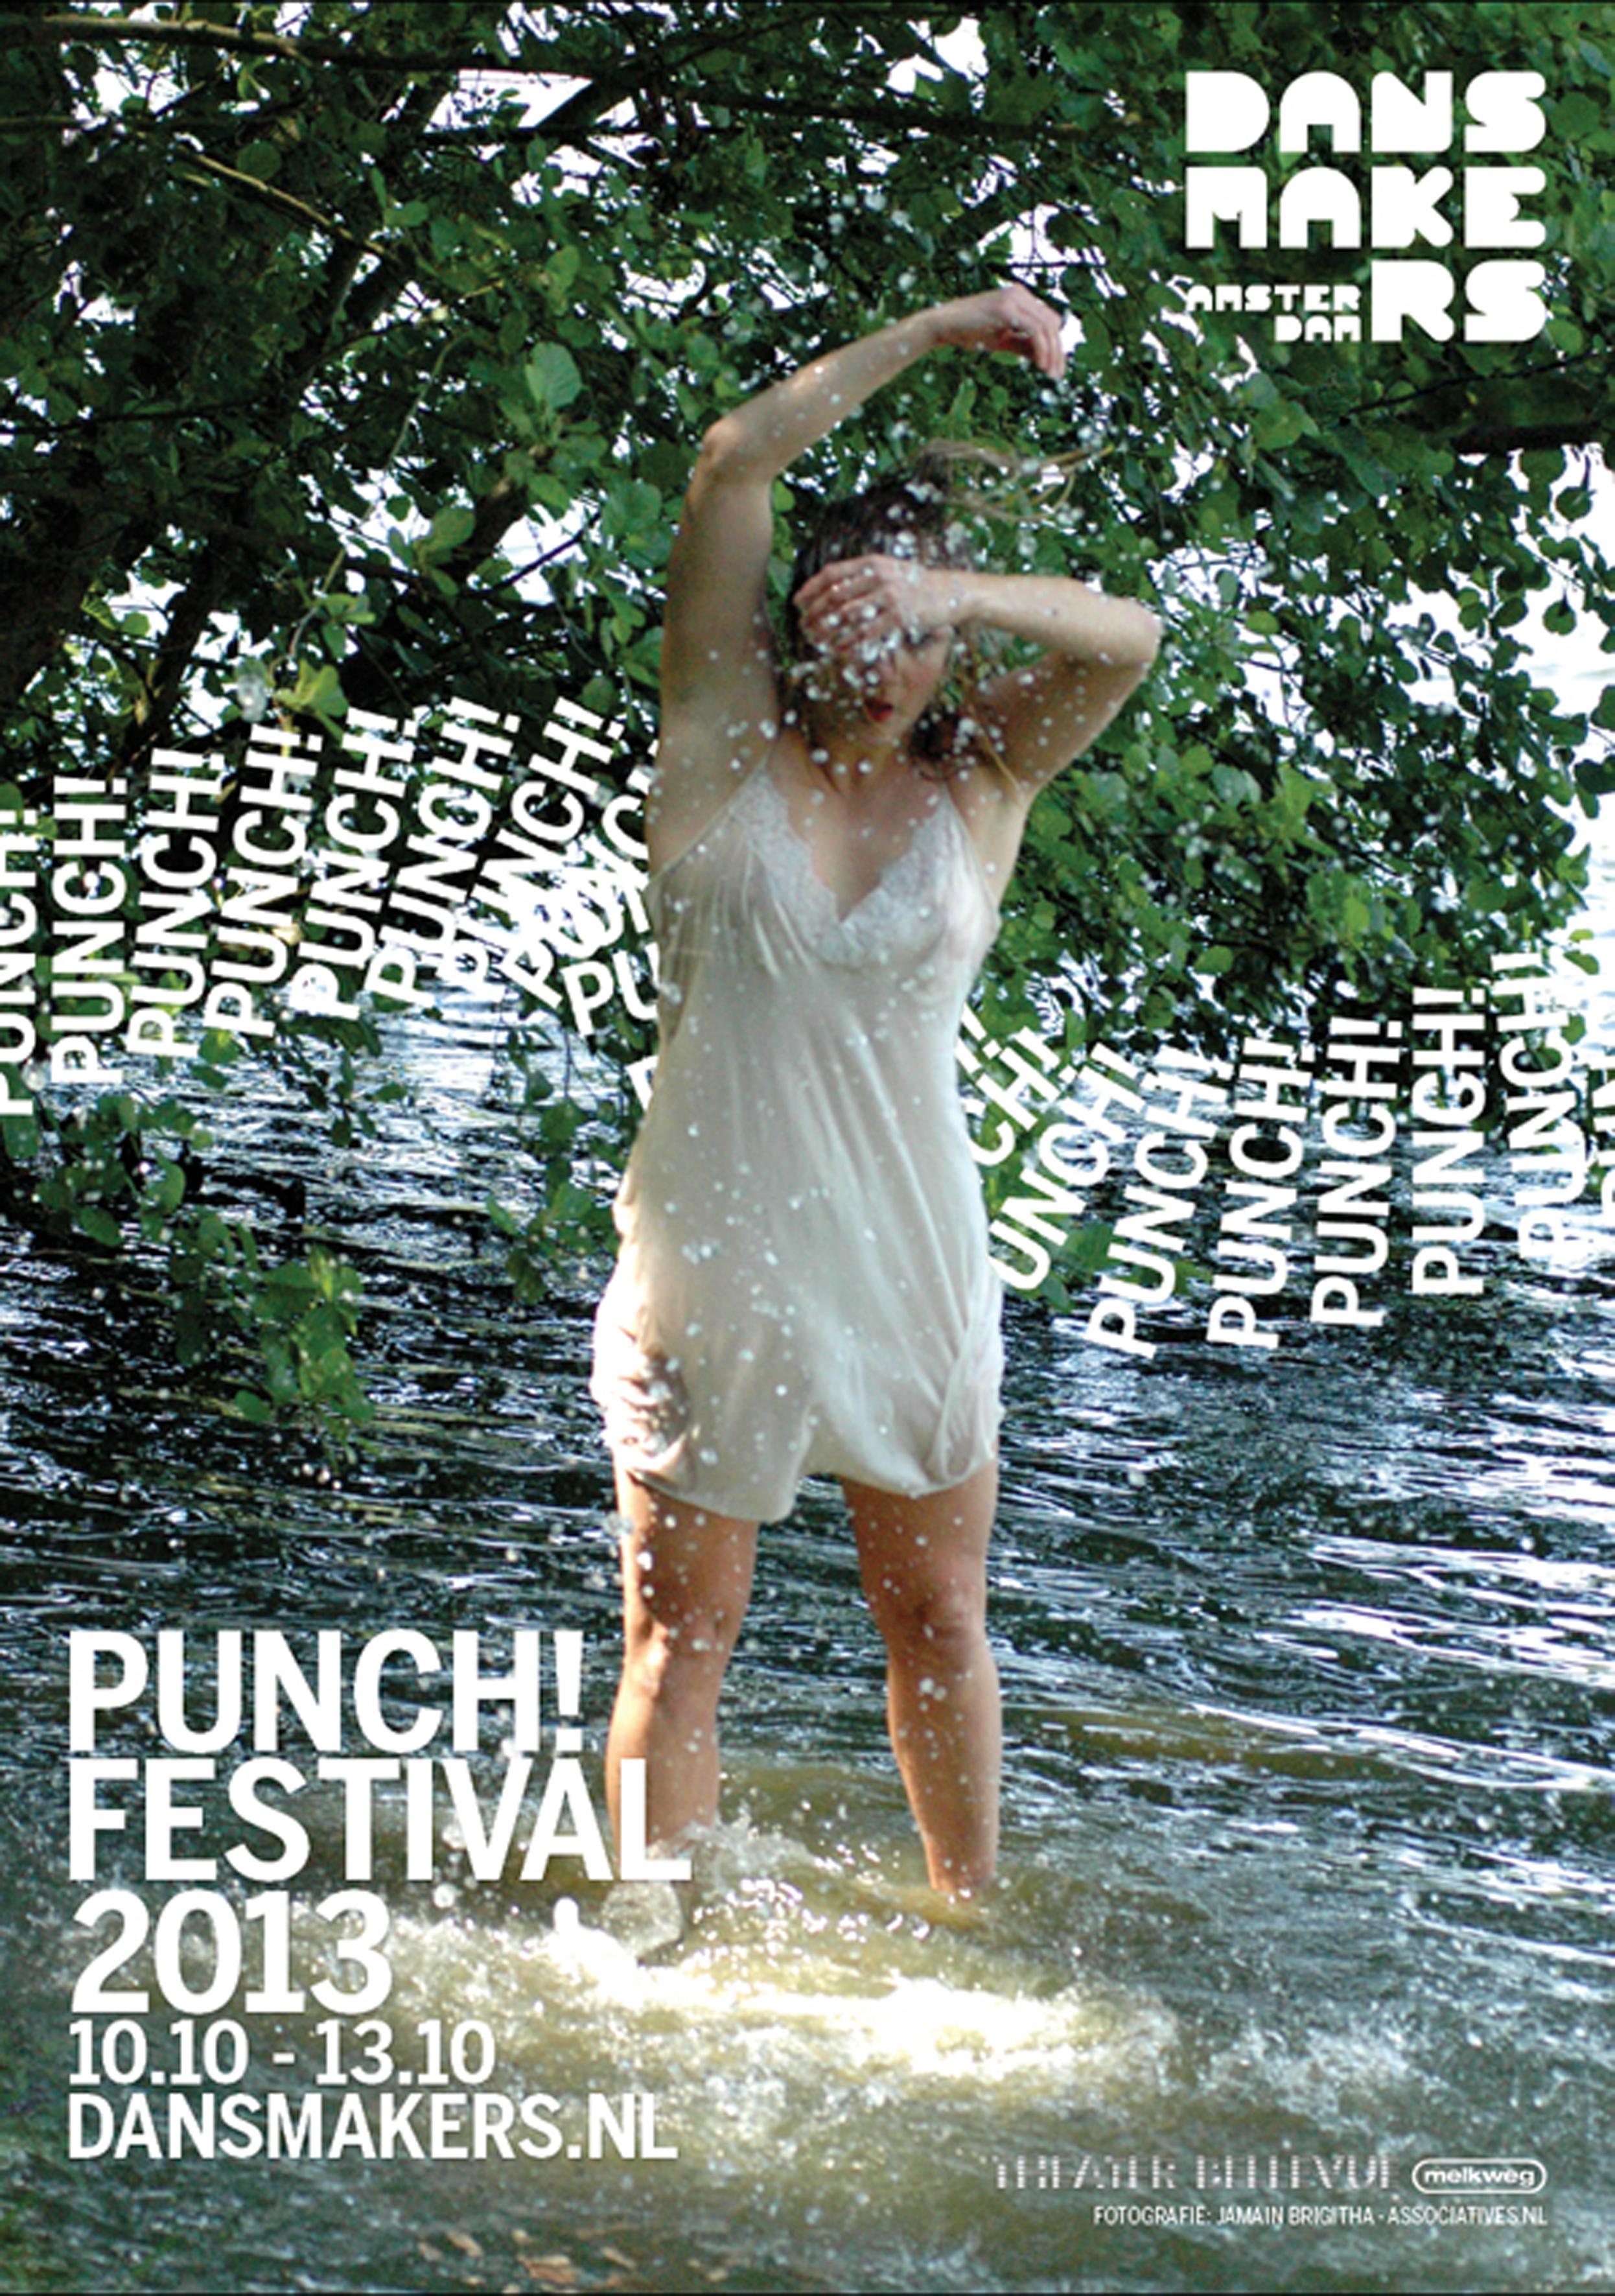 Punch! Festival